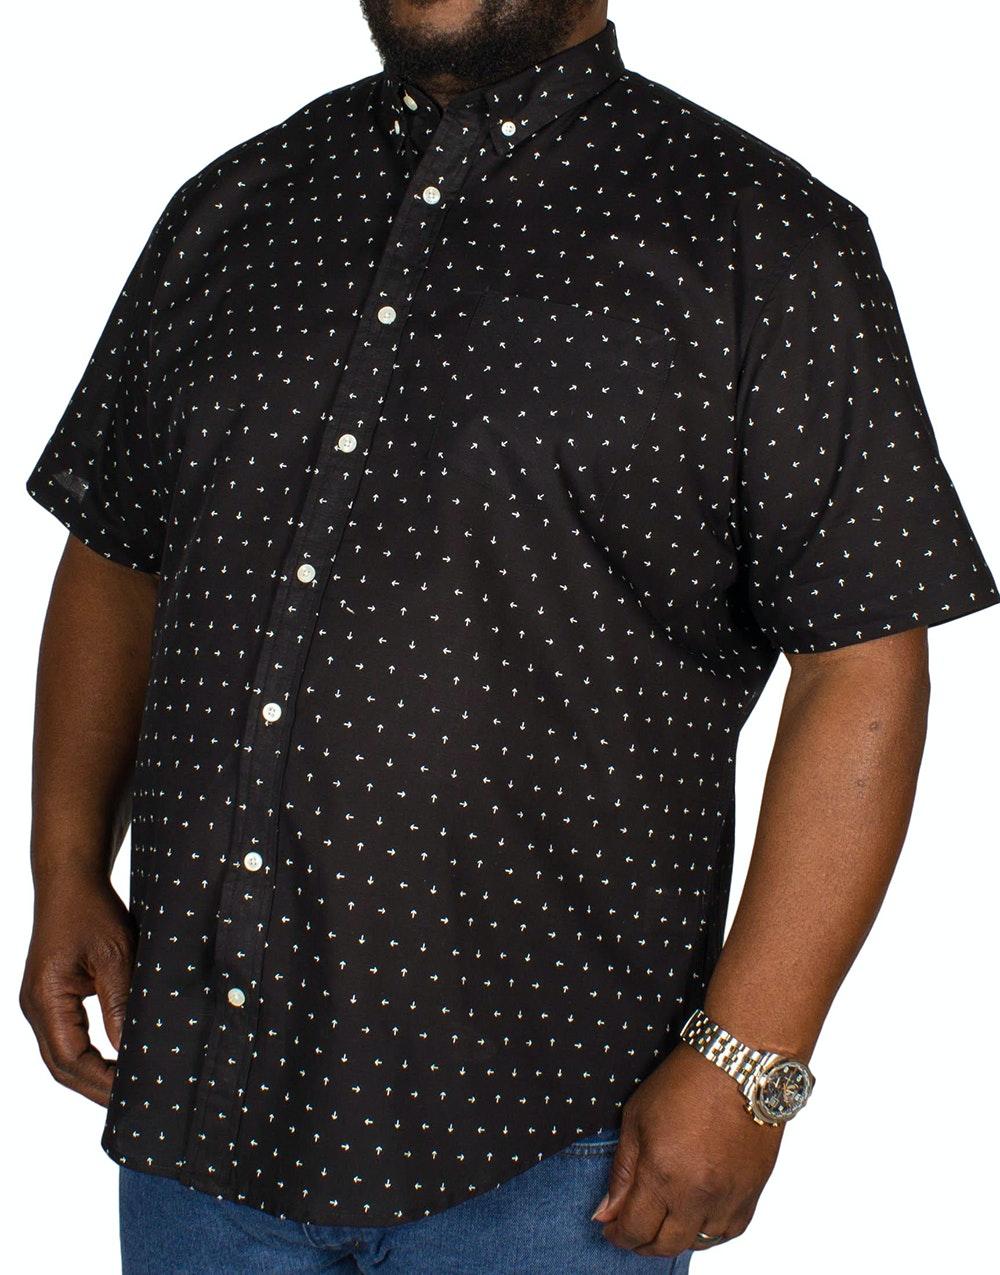 Bigdude All Over Arrow Print Shirt Black